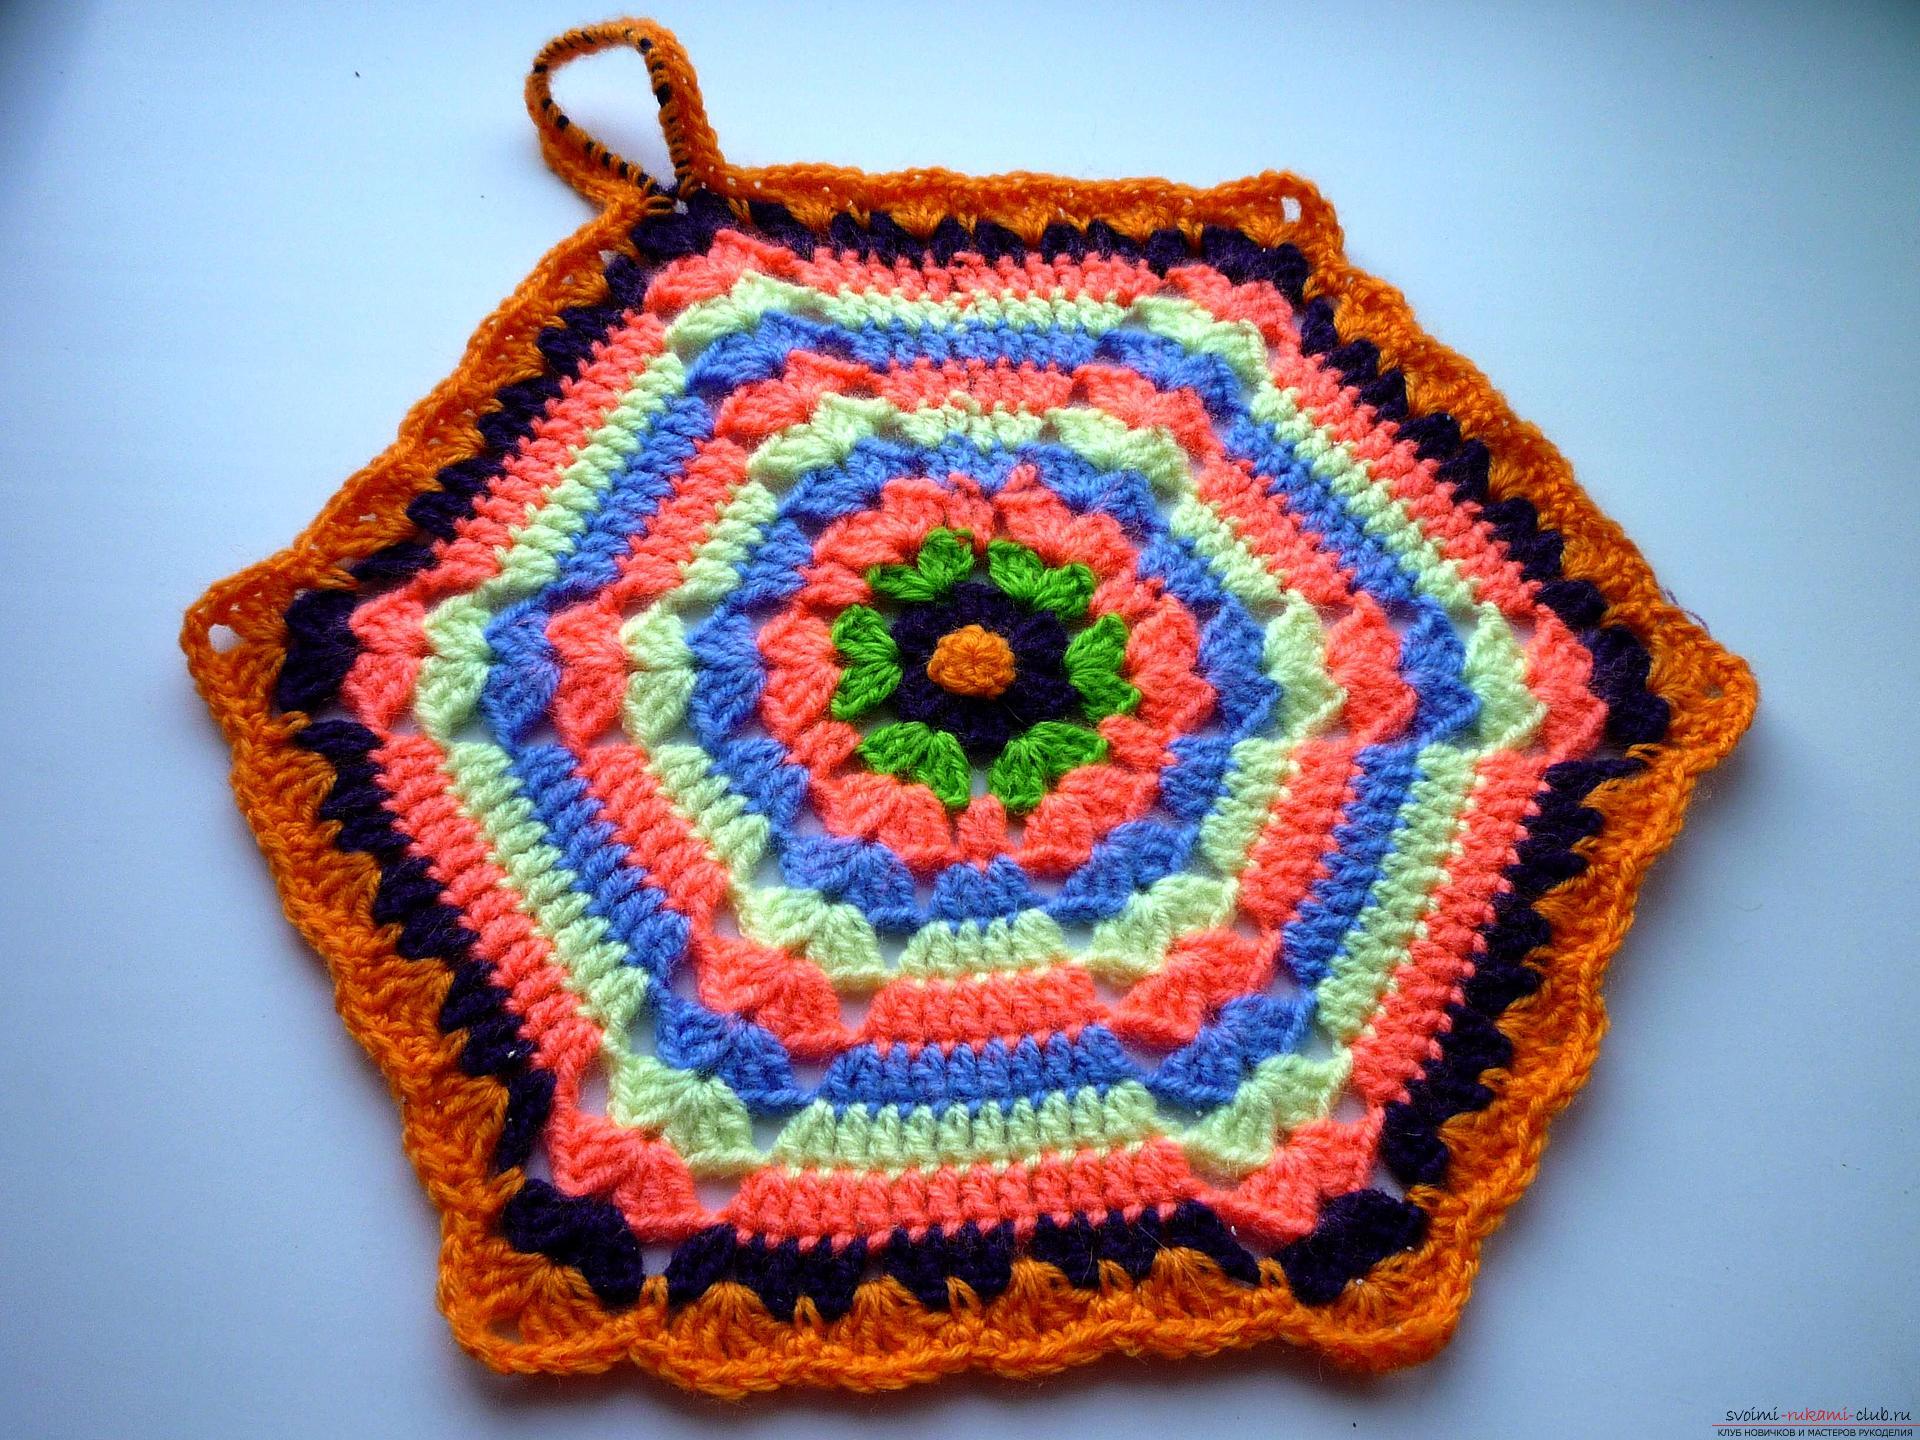 вязание: пинетки, носочки, следки, тапочки - Записи